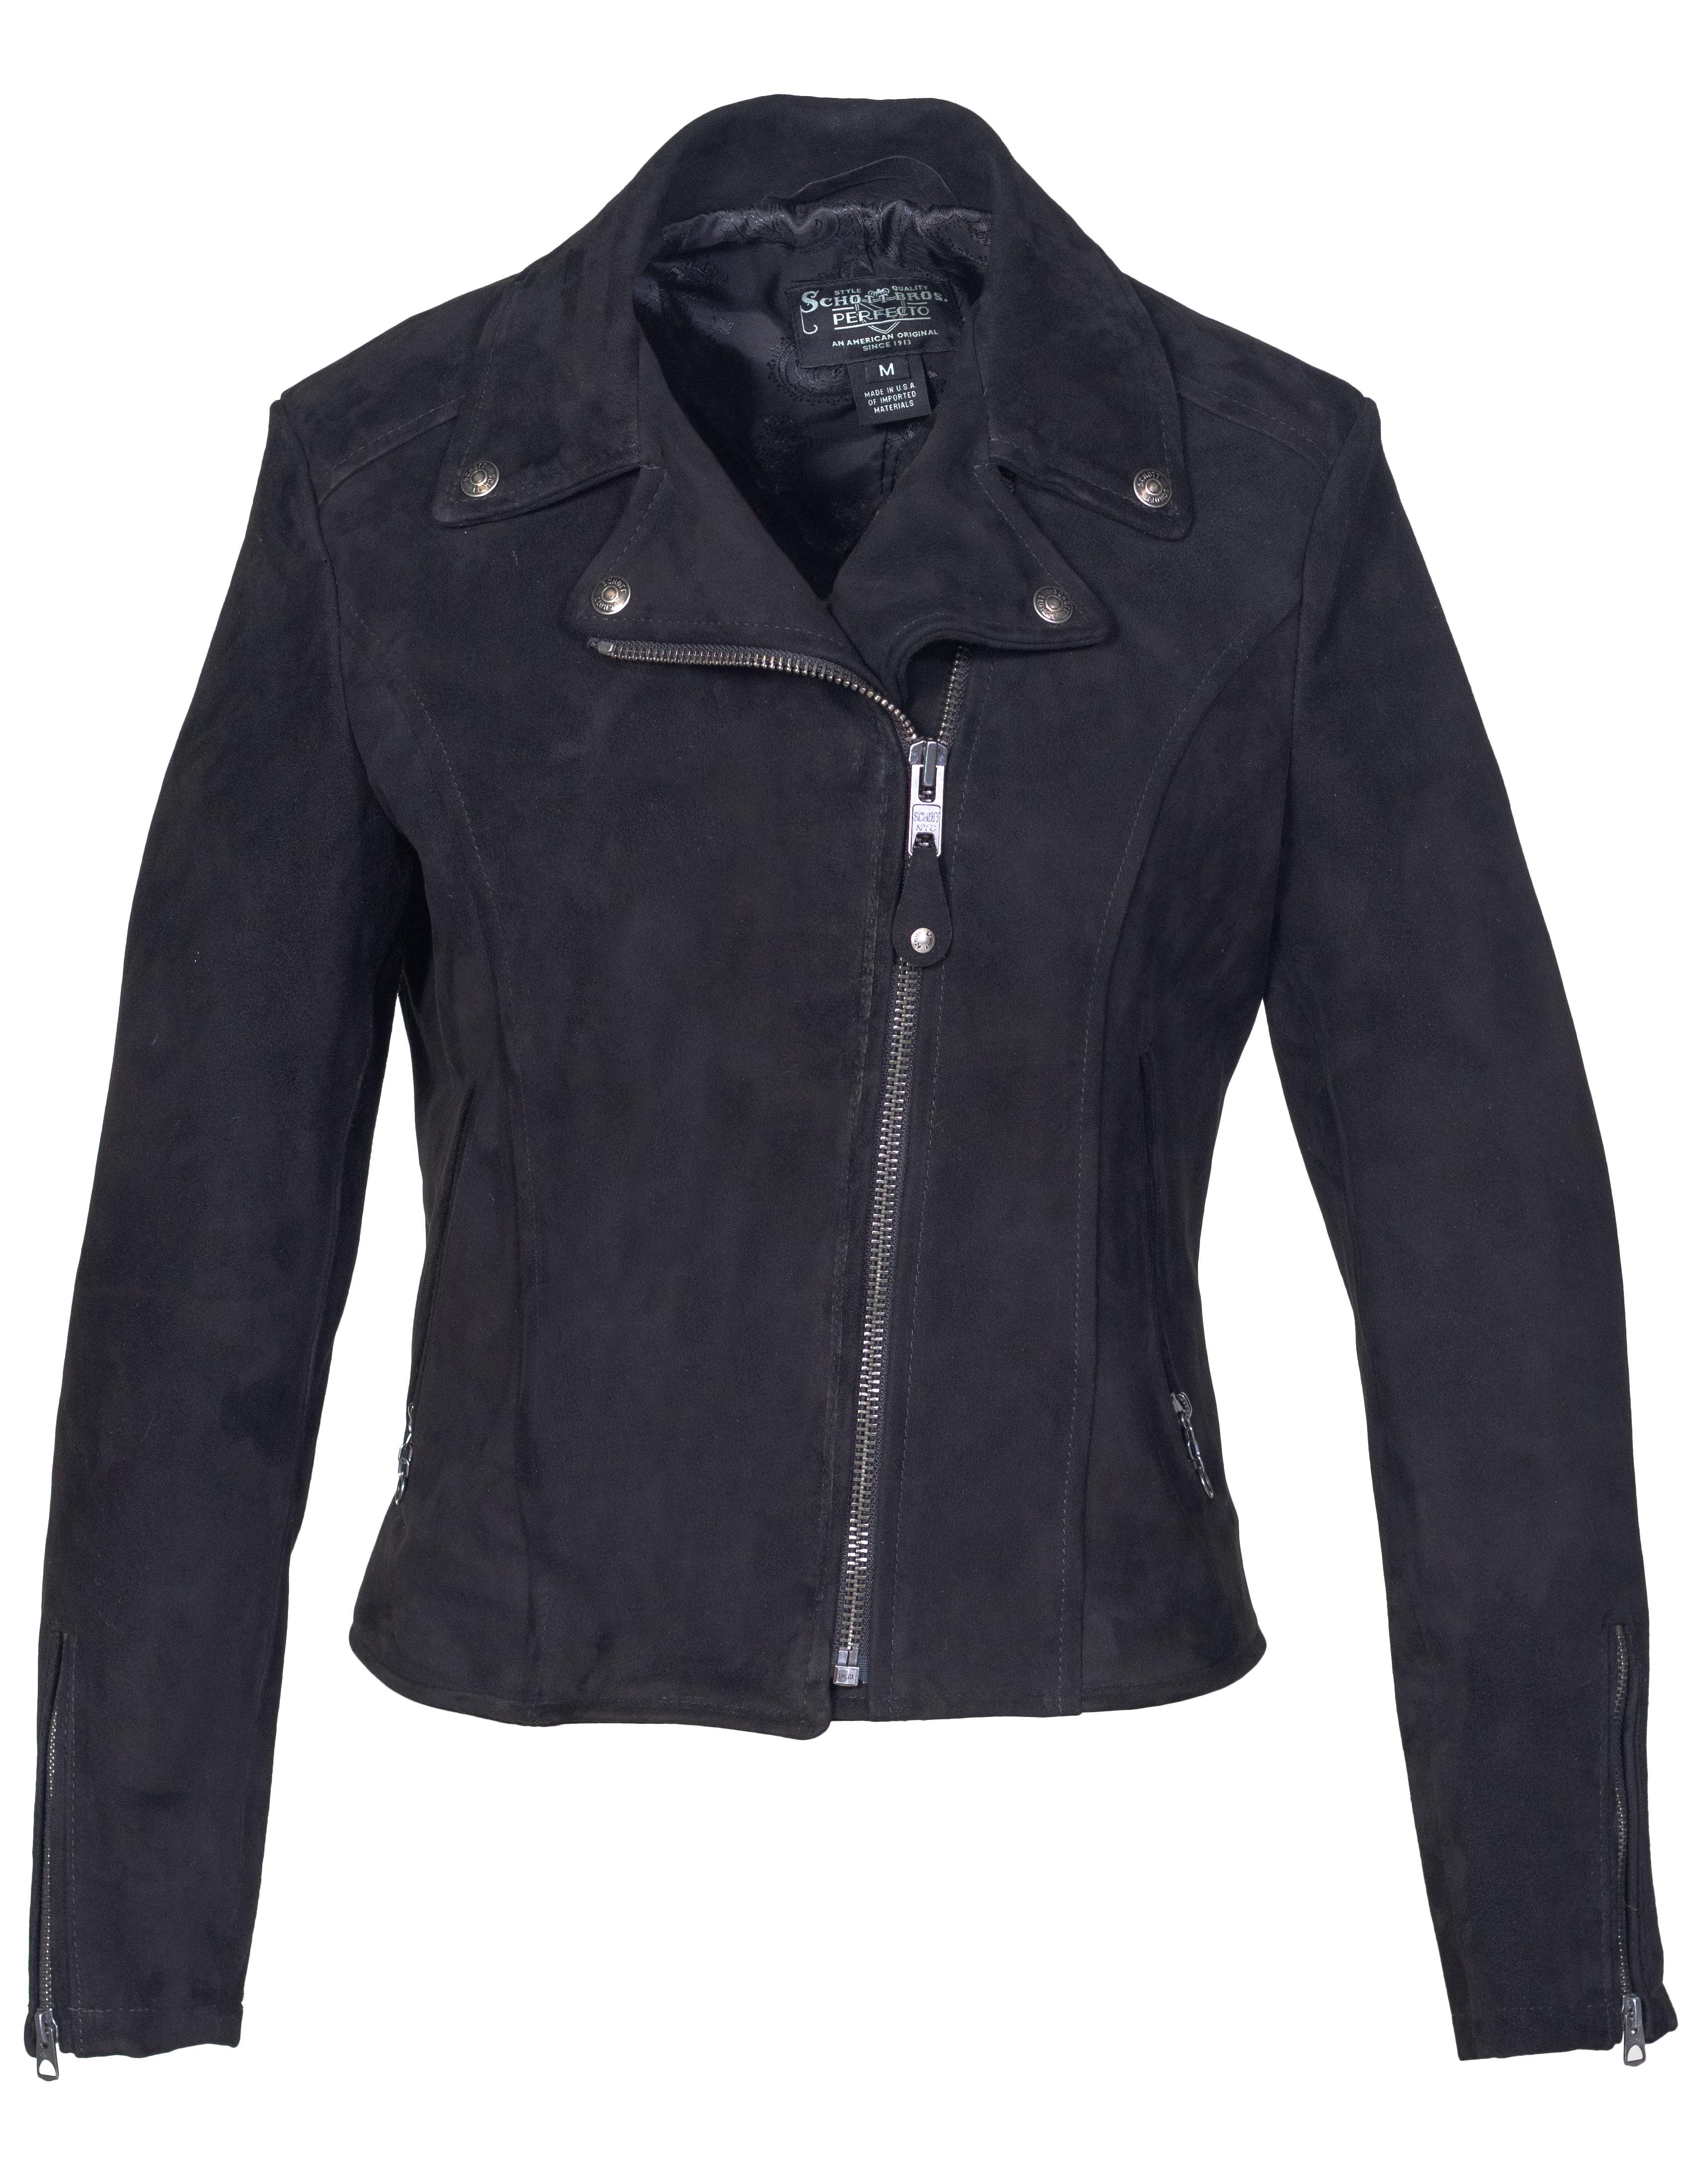 Schott N.Y.C. 206W Women's Fitted Suede Motorcycle Jacket